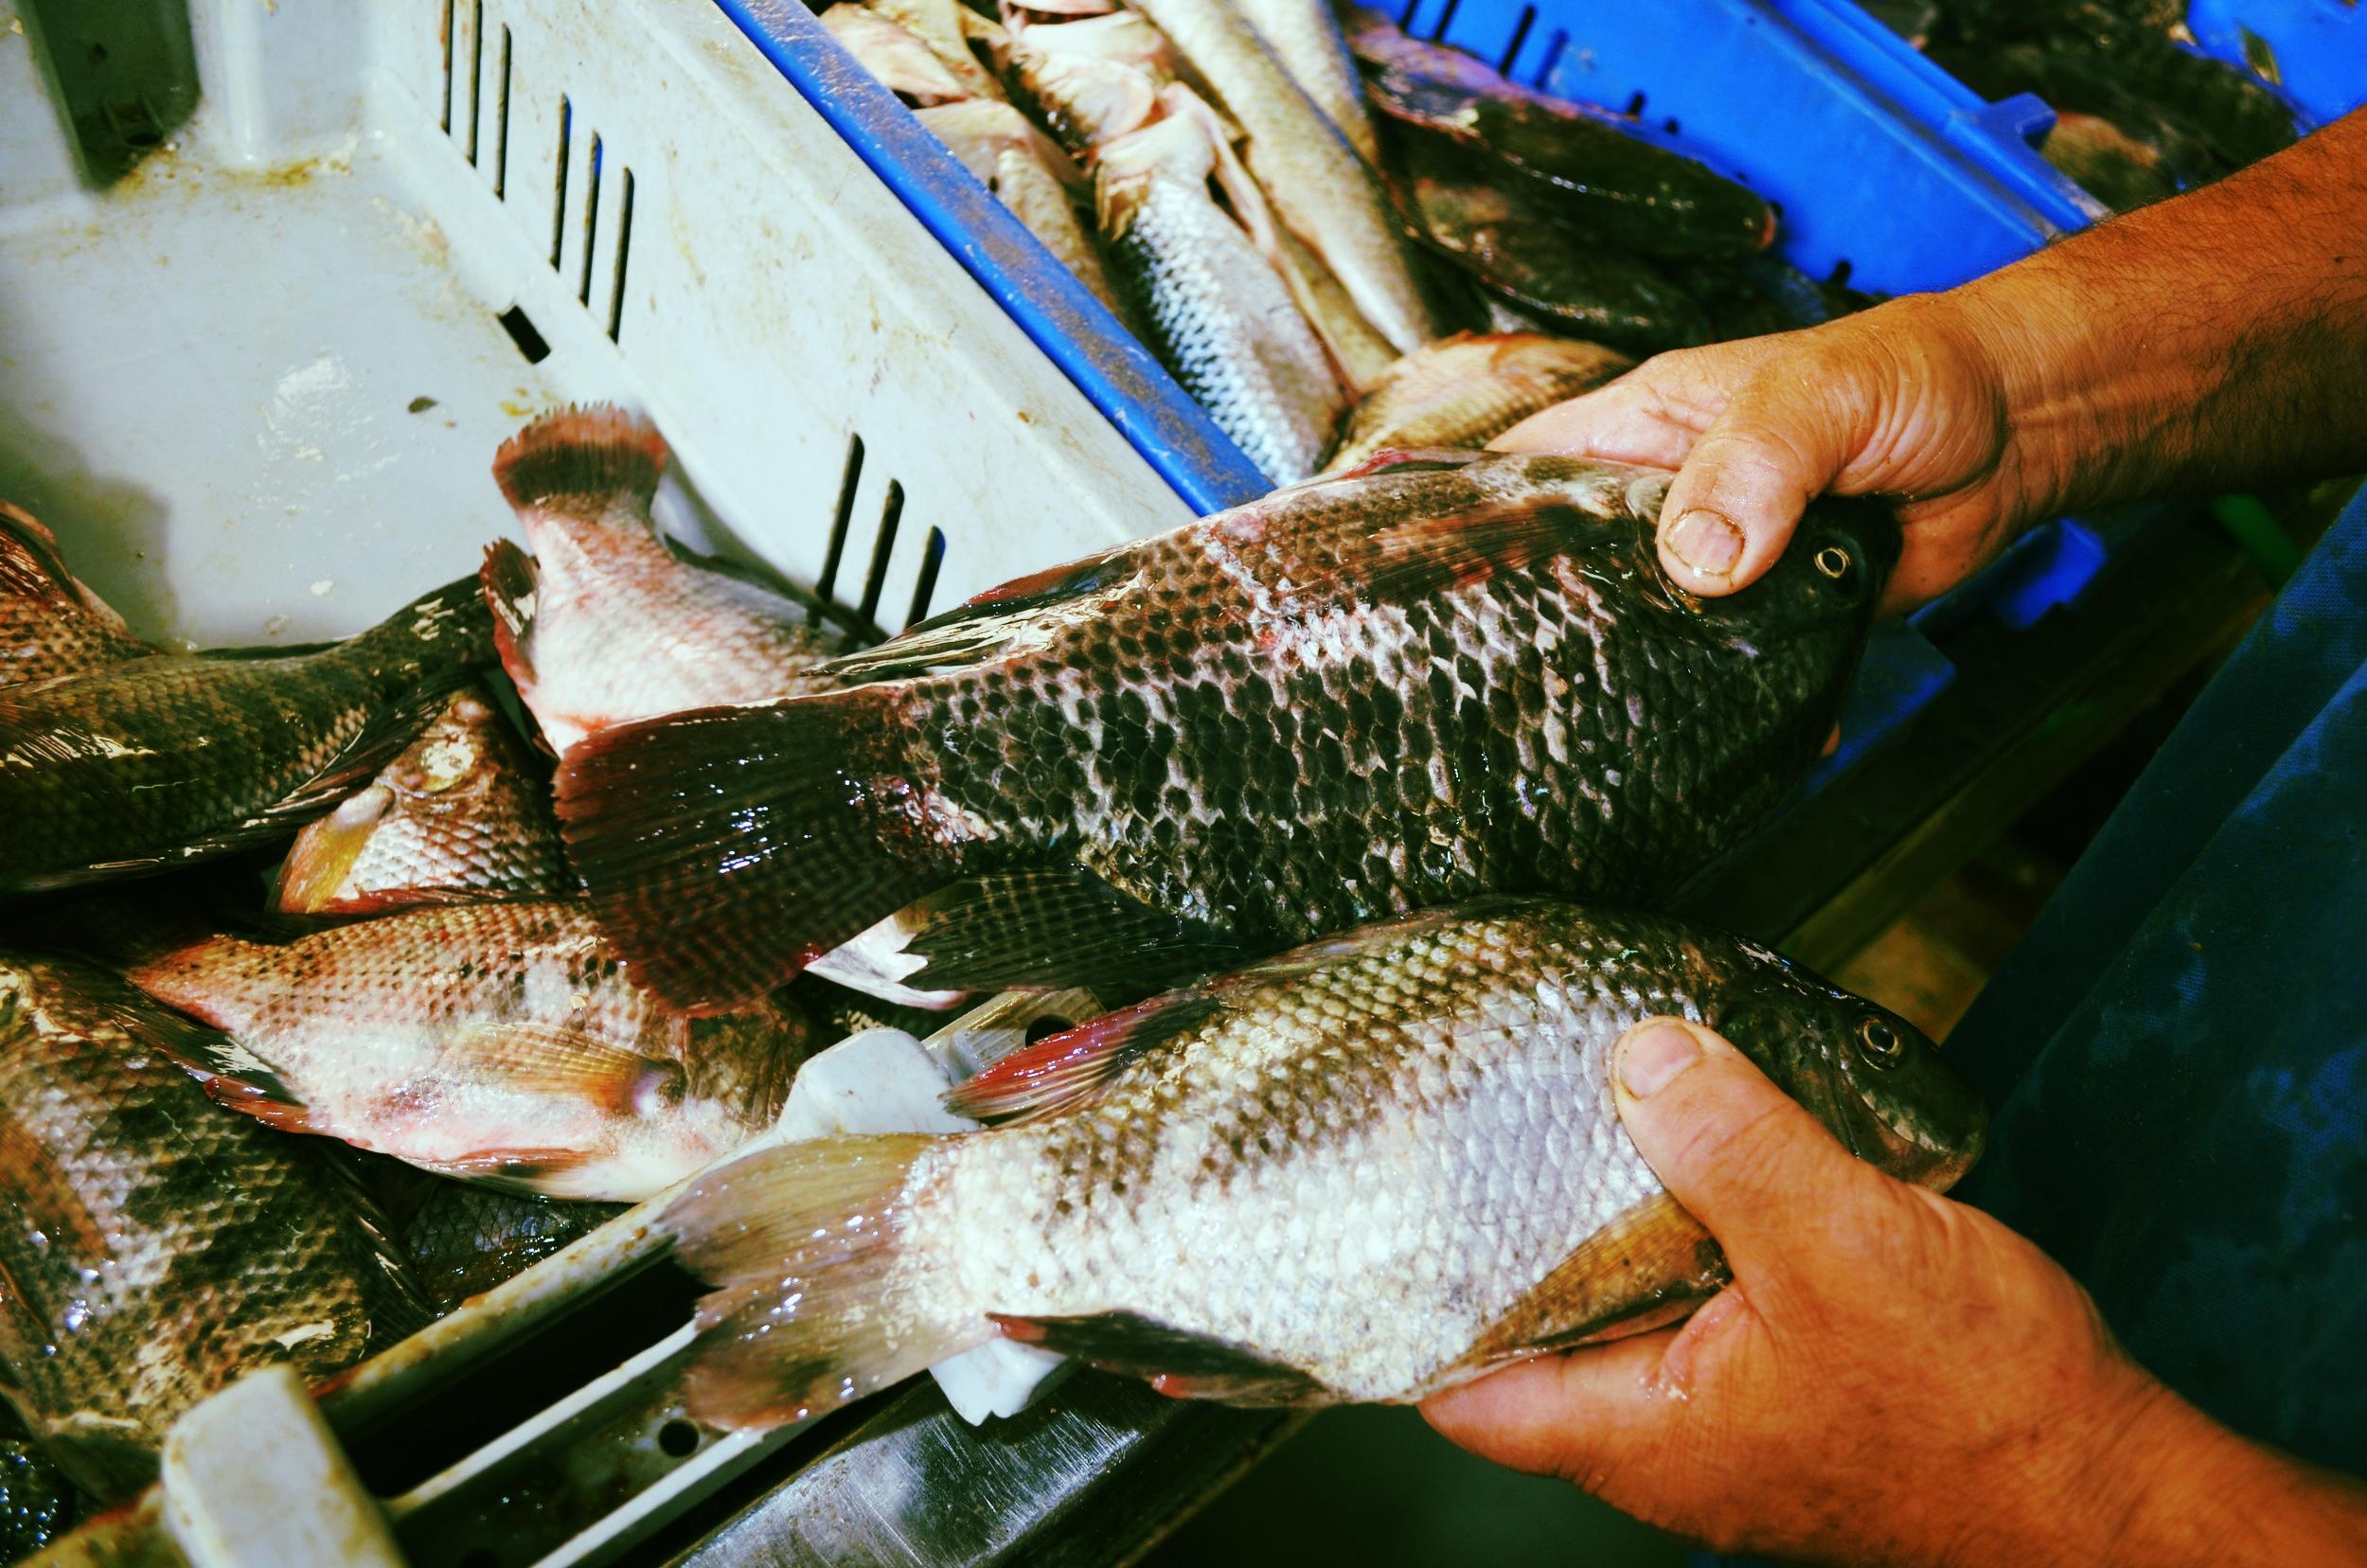 Musht--holding 2 fish.JPG